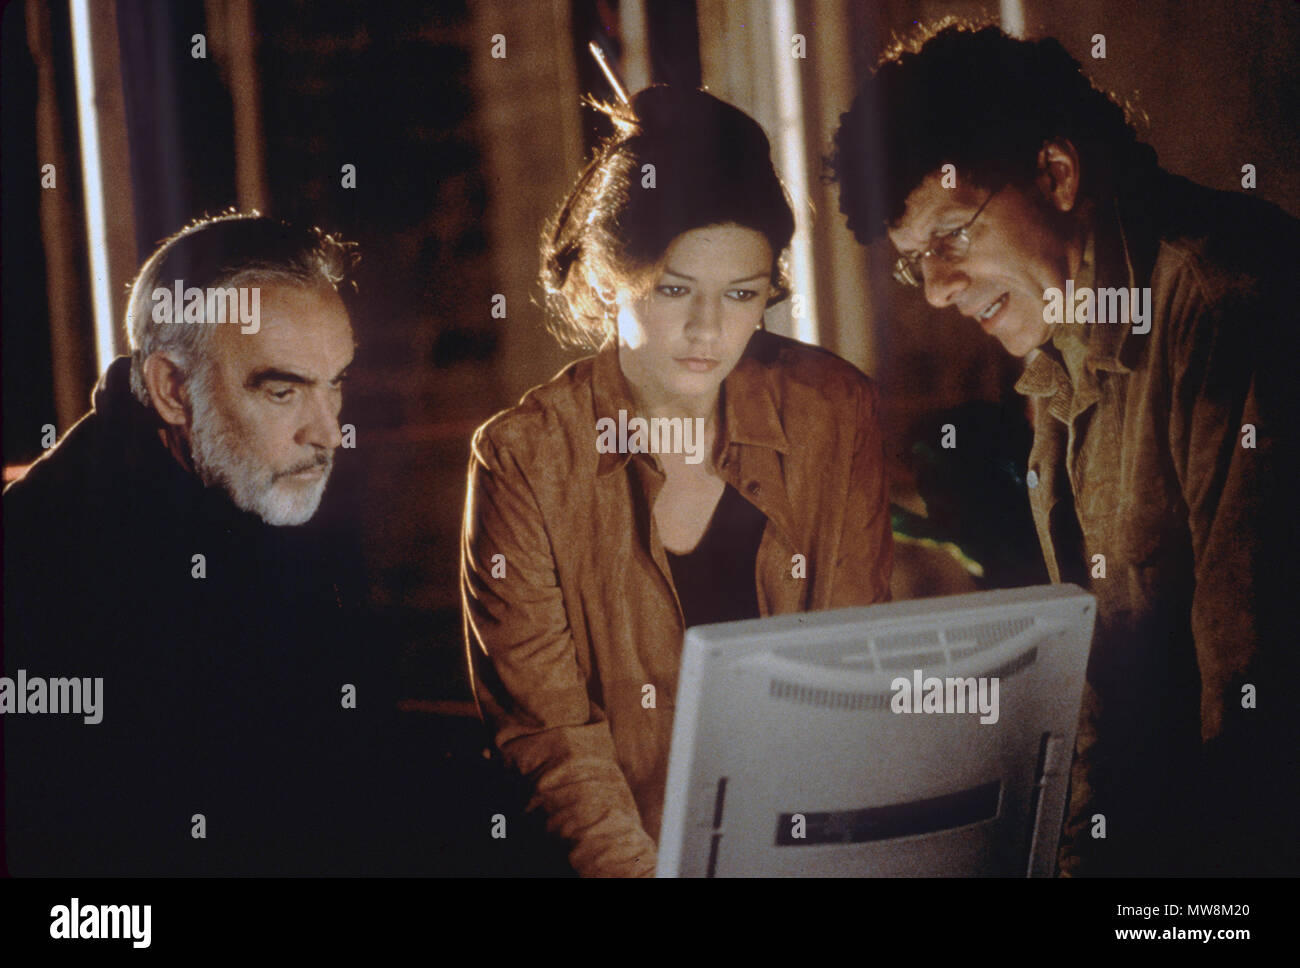 ENTRAPMENT 1999 20th Century Fox film with from left: Sean Connery, Catherine Zeta-Jones, Will Paton - Stock Image